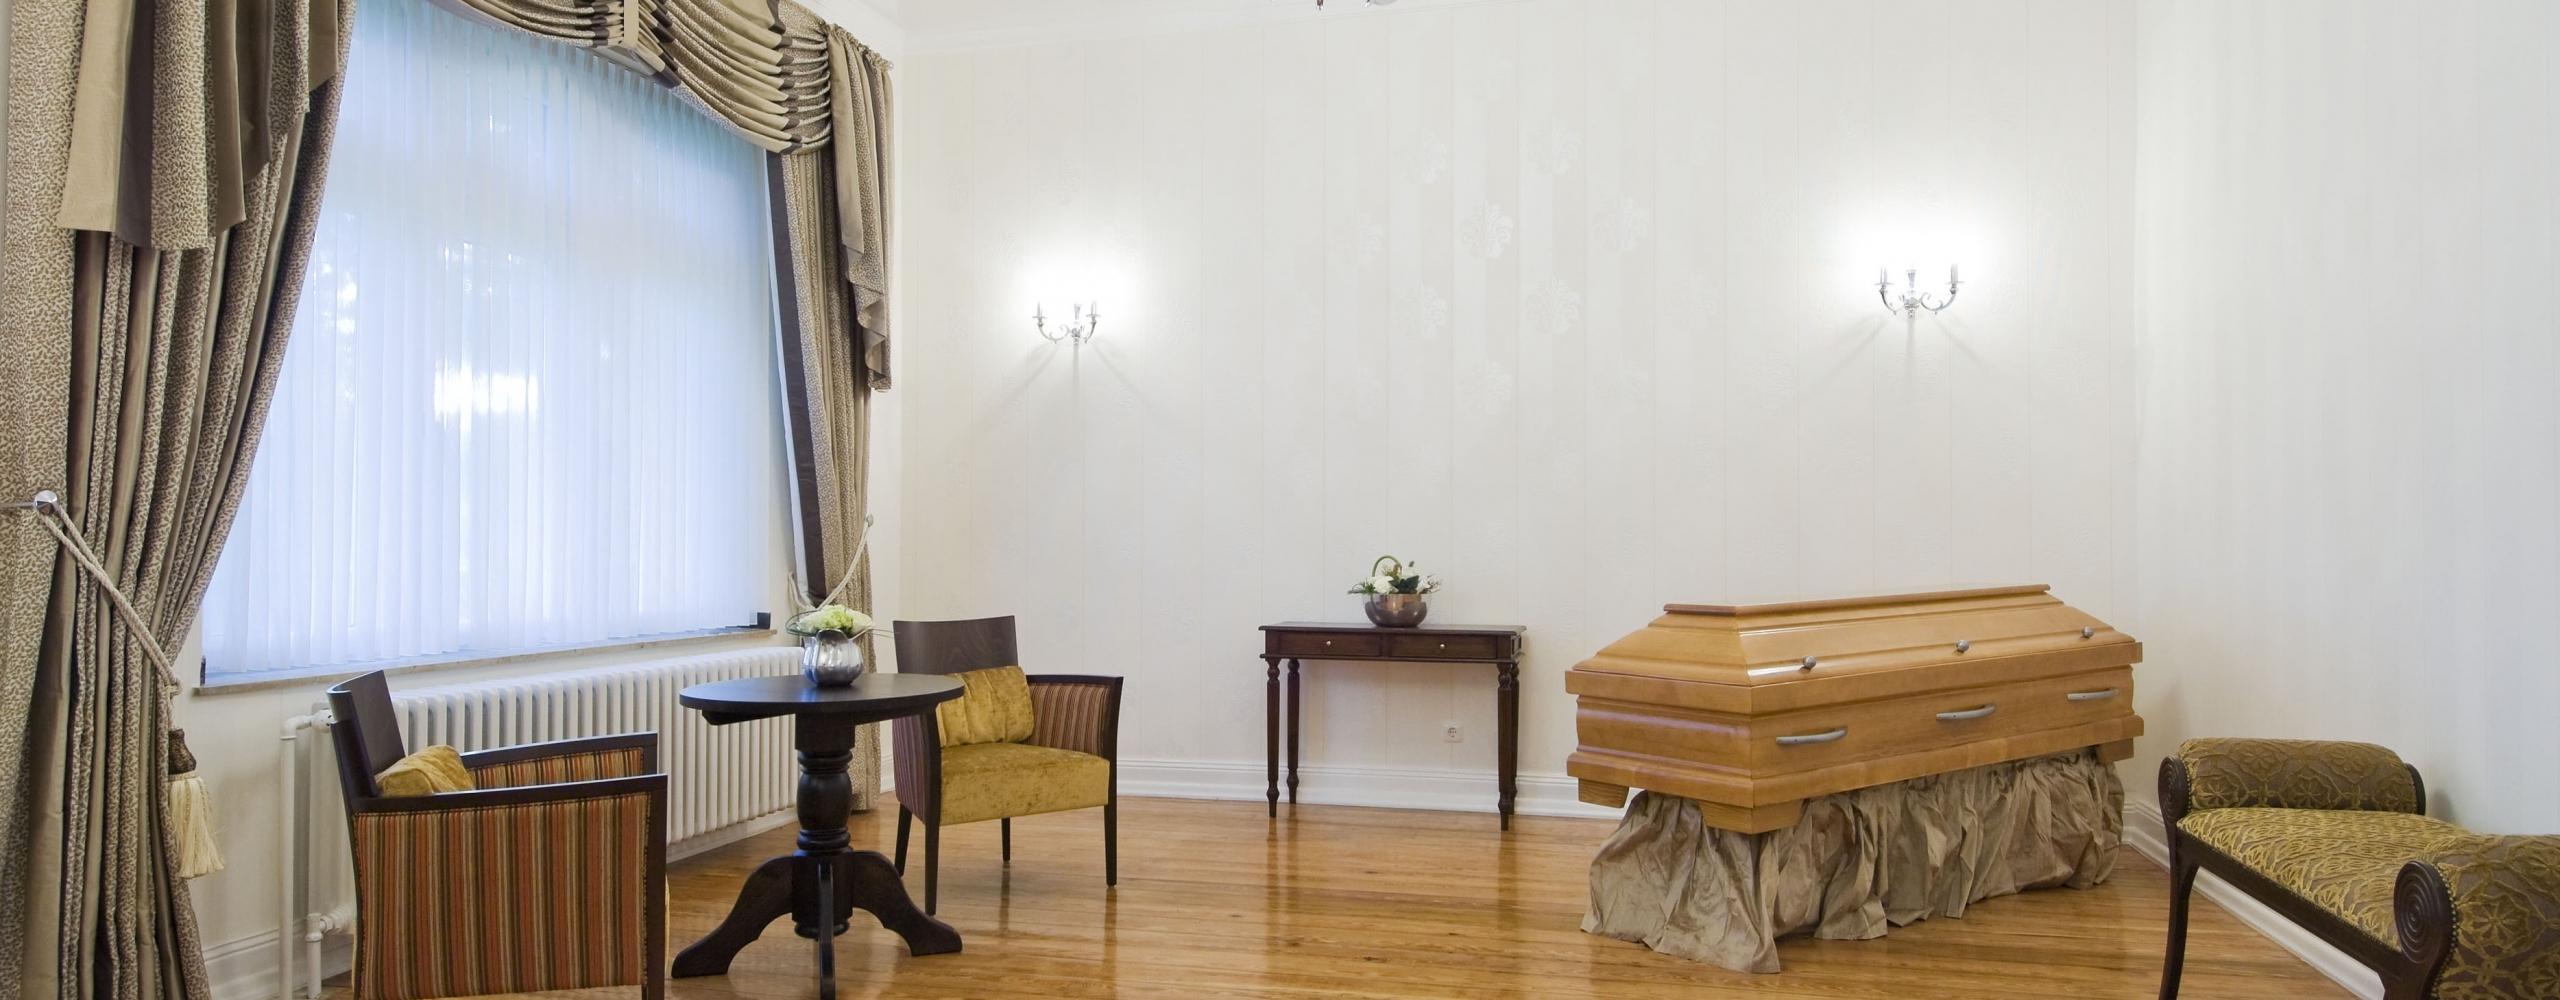 Beratung Privatisierung - Krematorium Kaufen